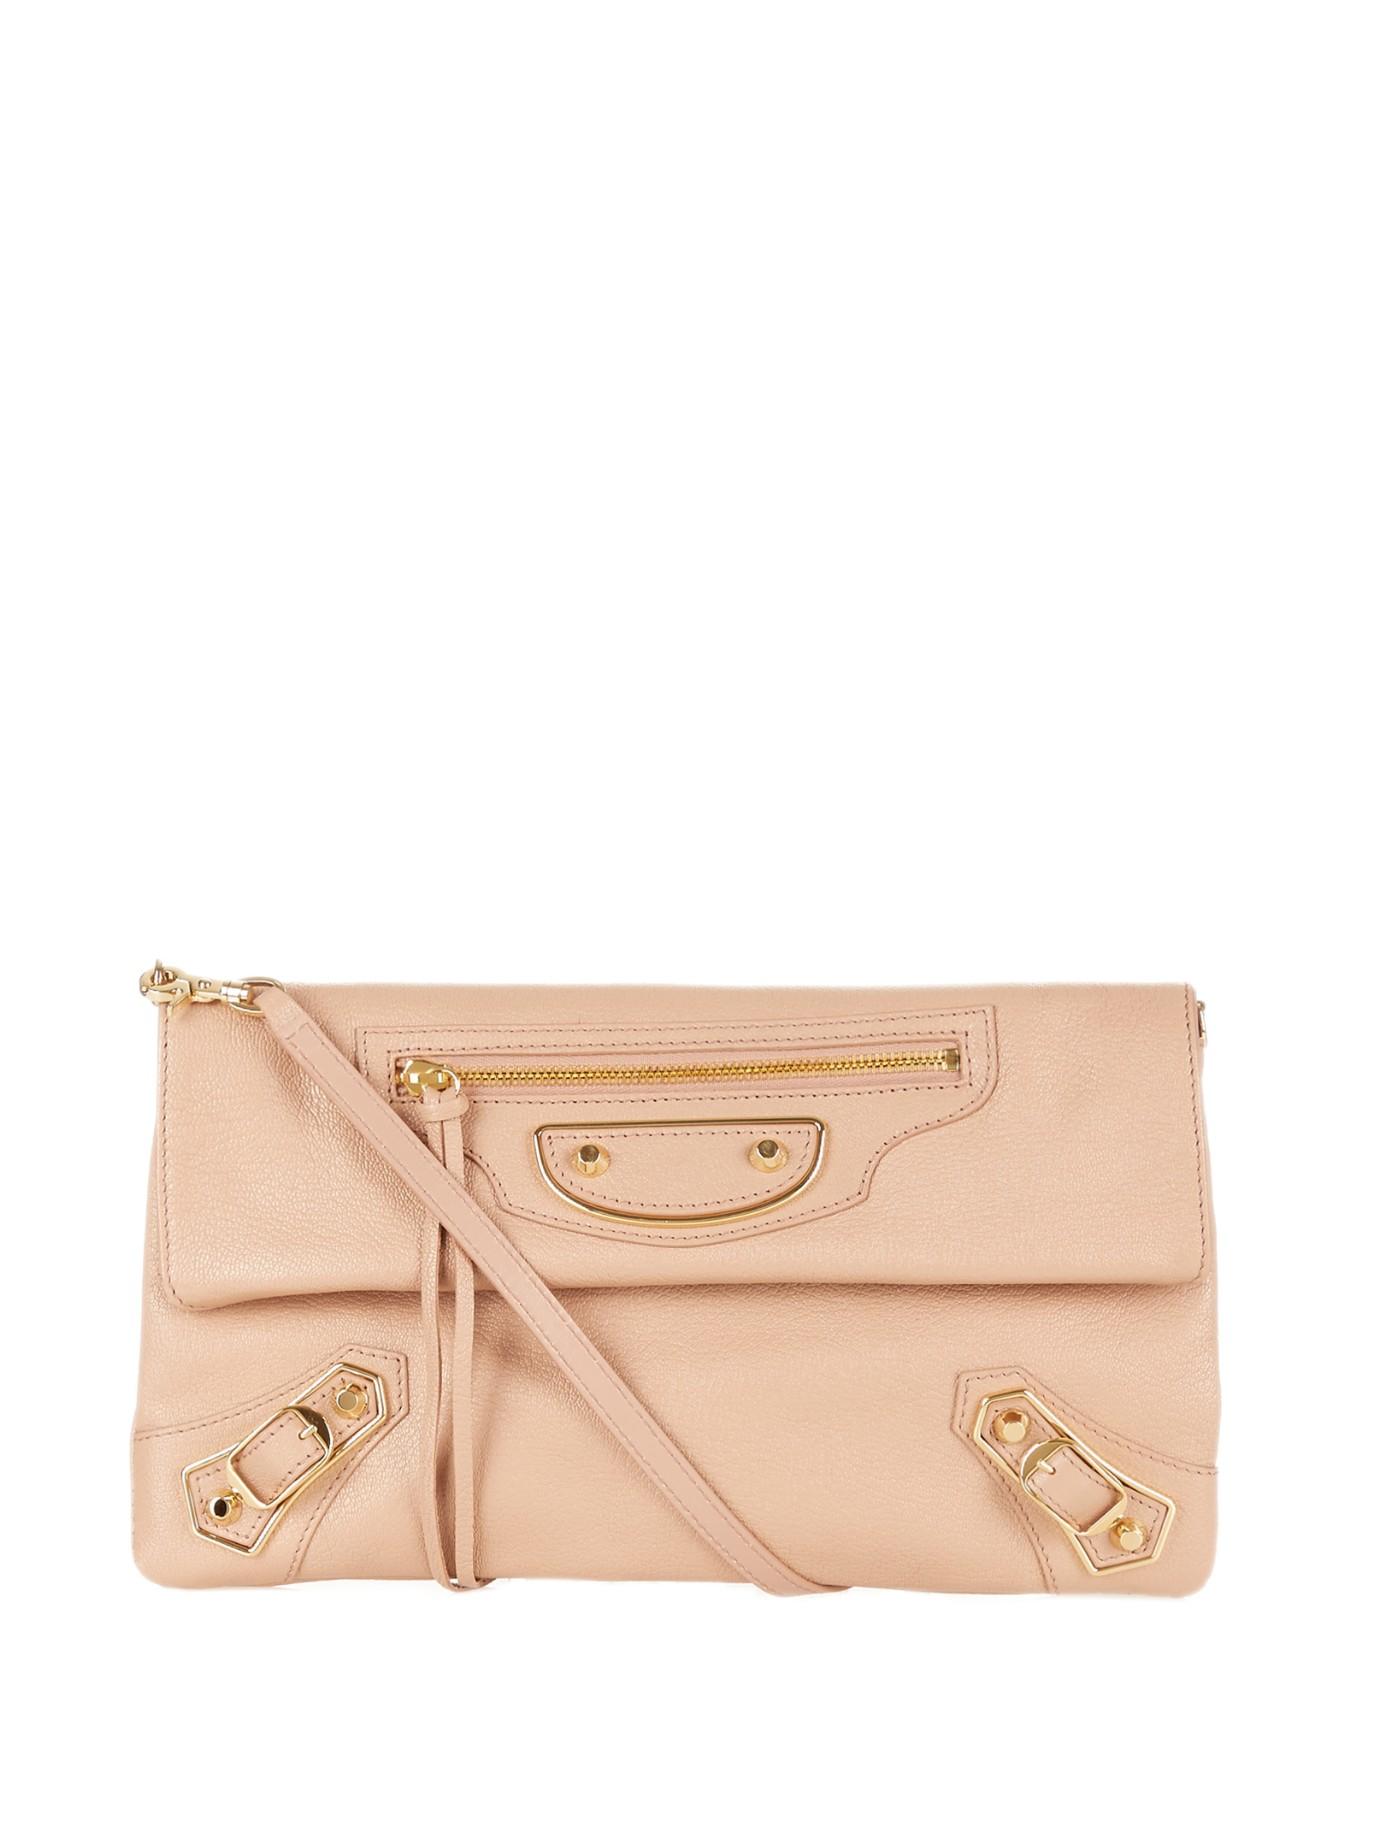 48873a069a Balenciaga Classic Metallic-edge Leather Envelope Clutch in Pink - Lyst